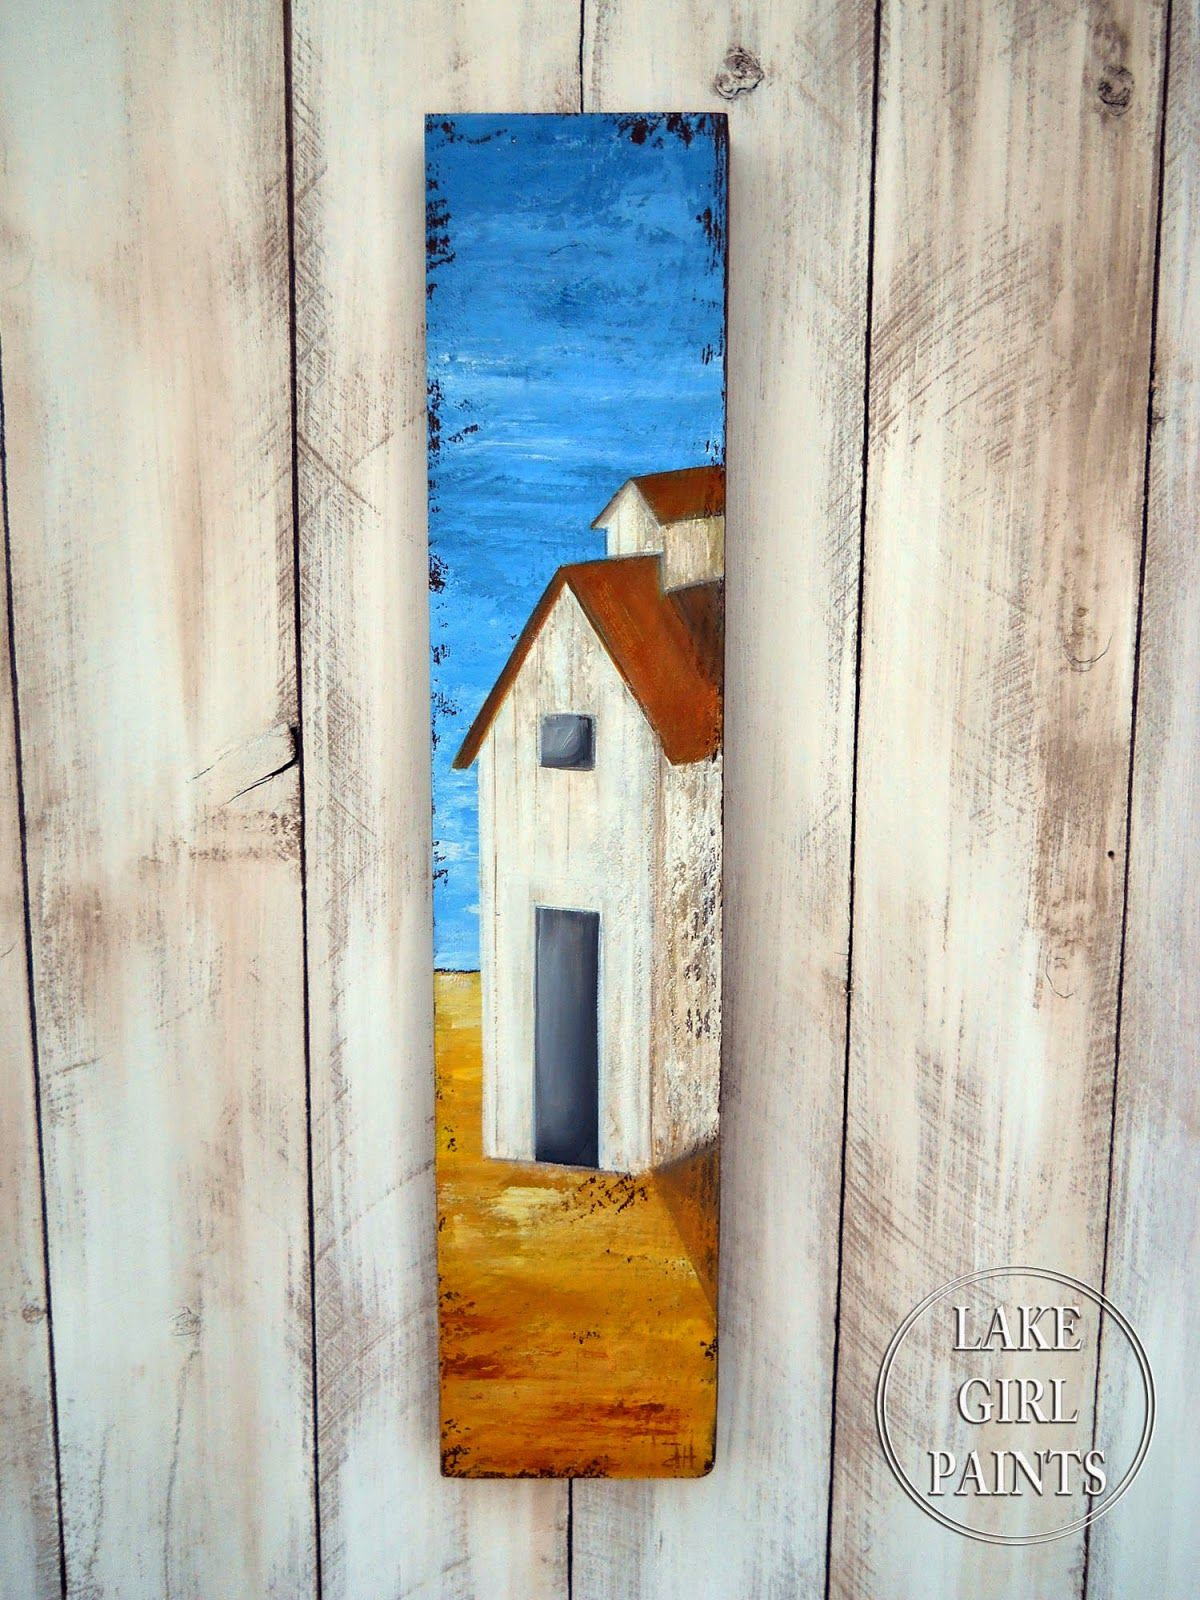 Lake girl paints countryside folk art aa lushes buildings